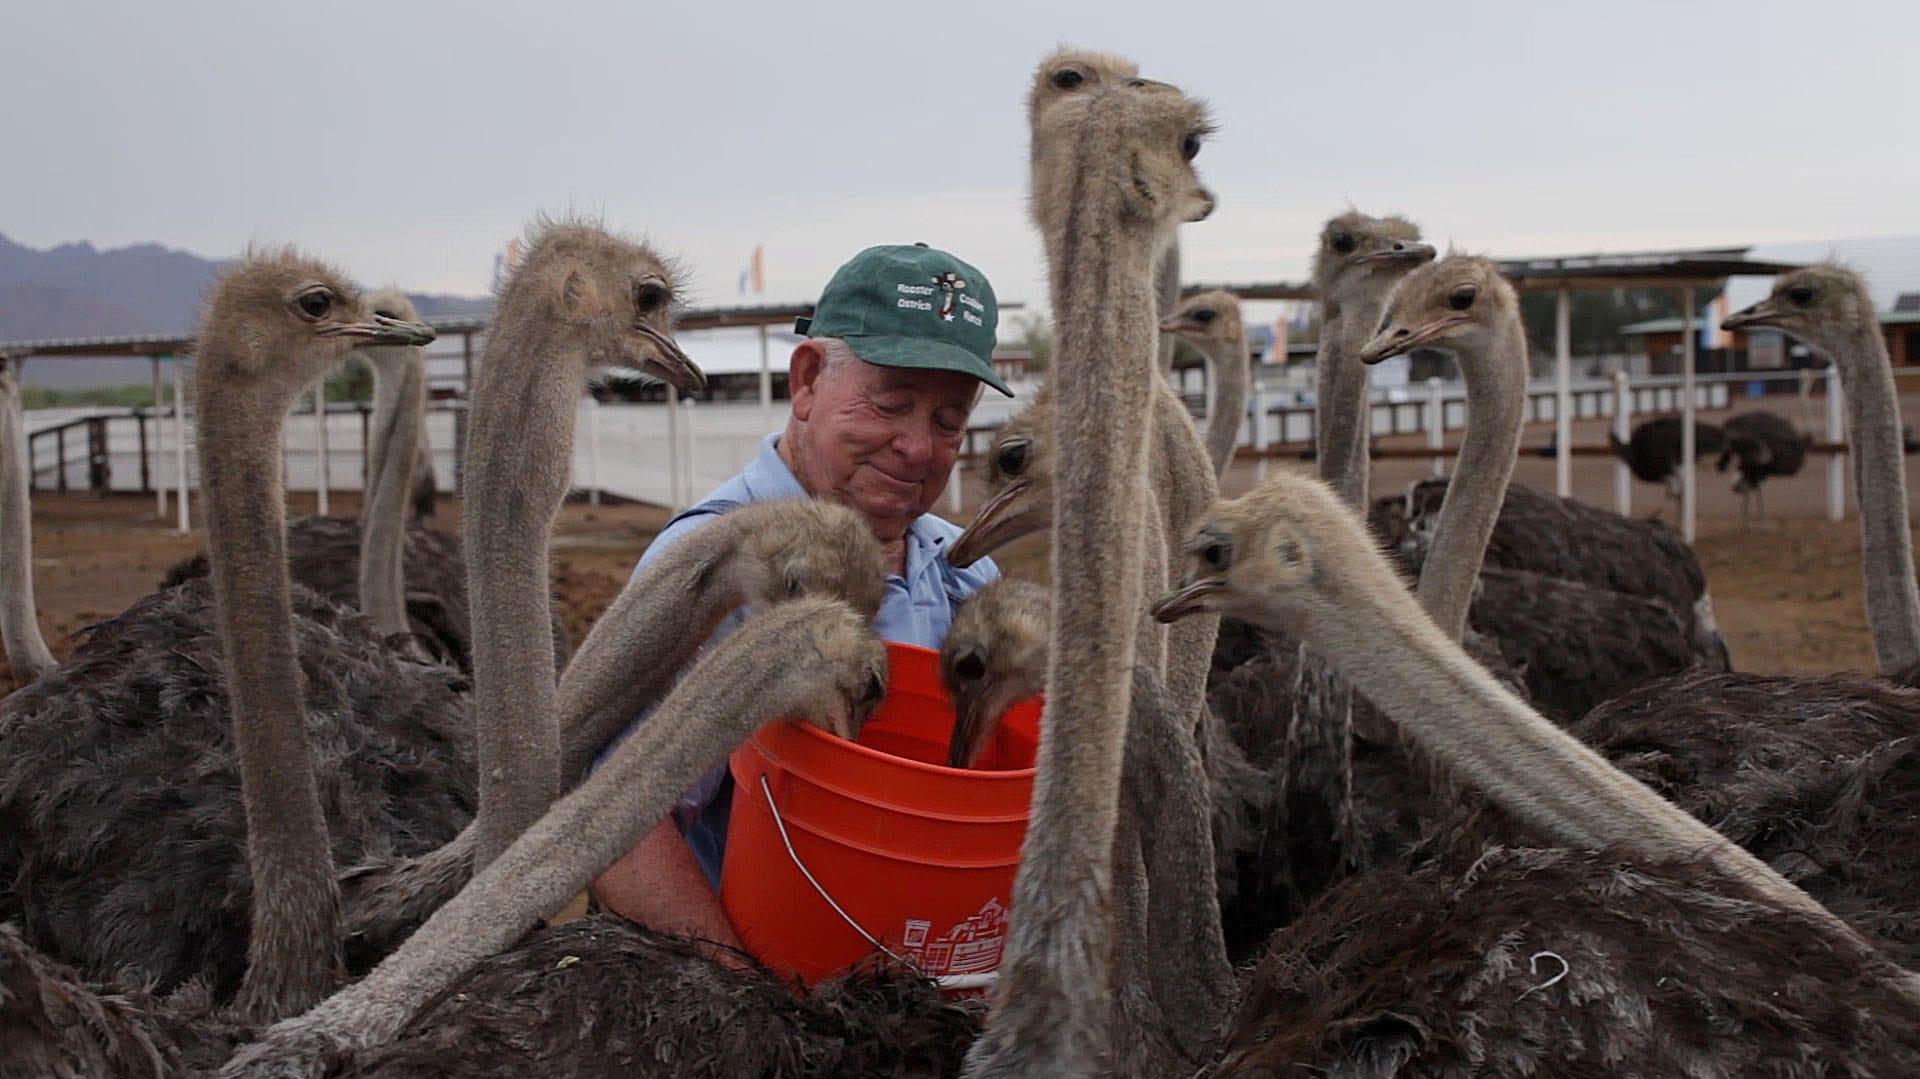 dream to revolutionize ostrich industry crumbles